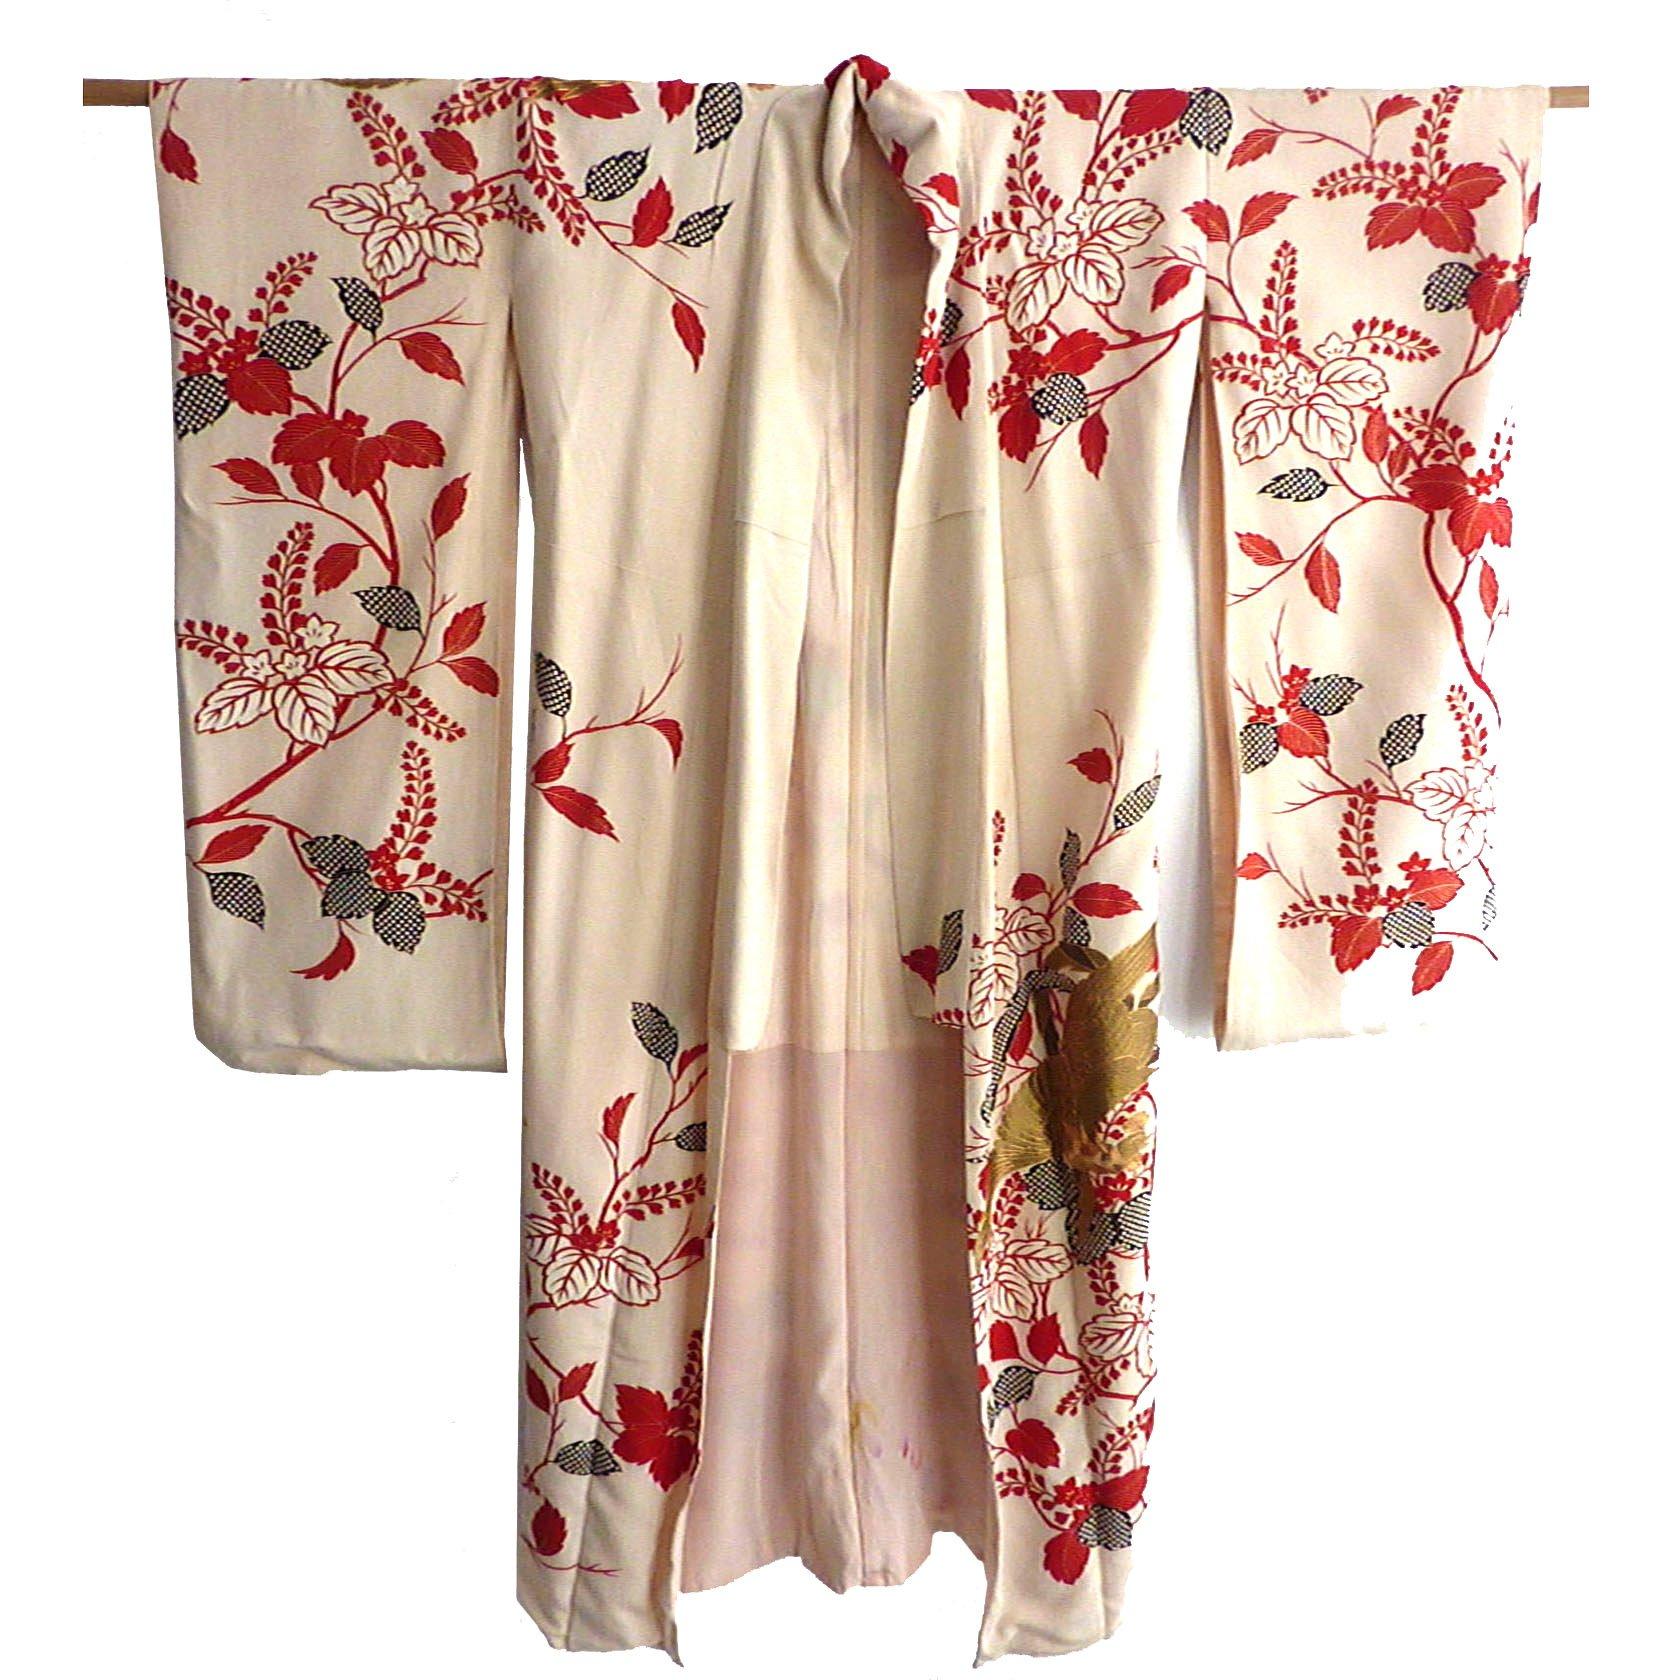 vintage silk kimono at selectioncoste.com